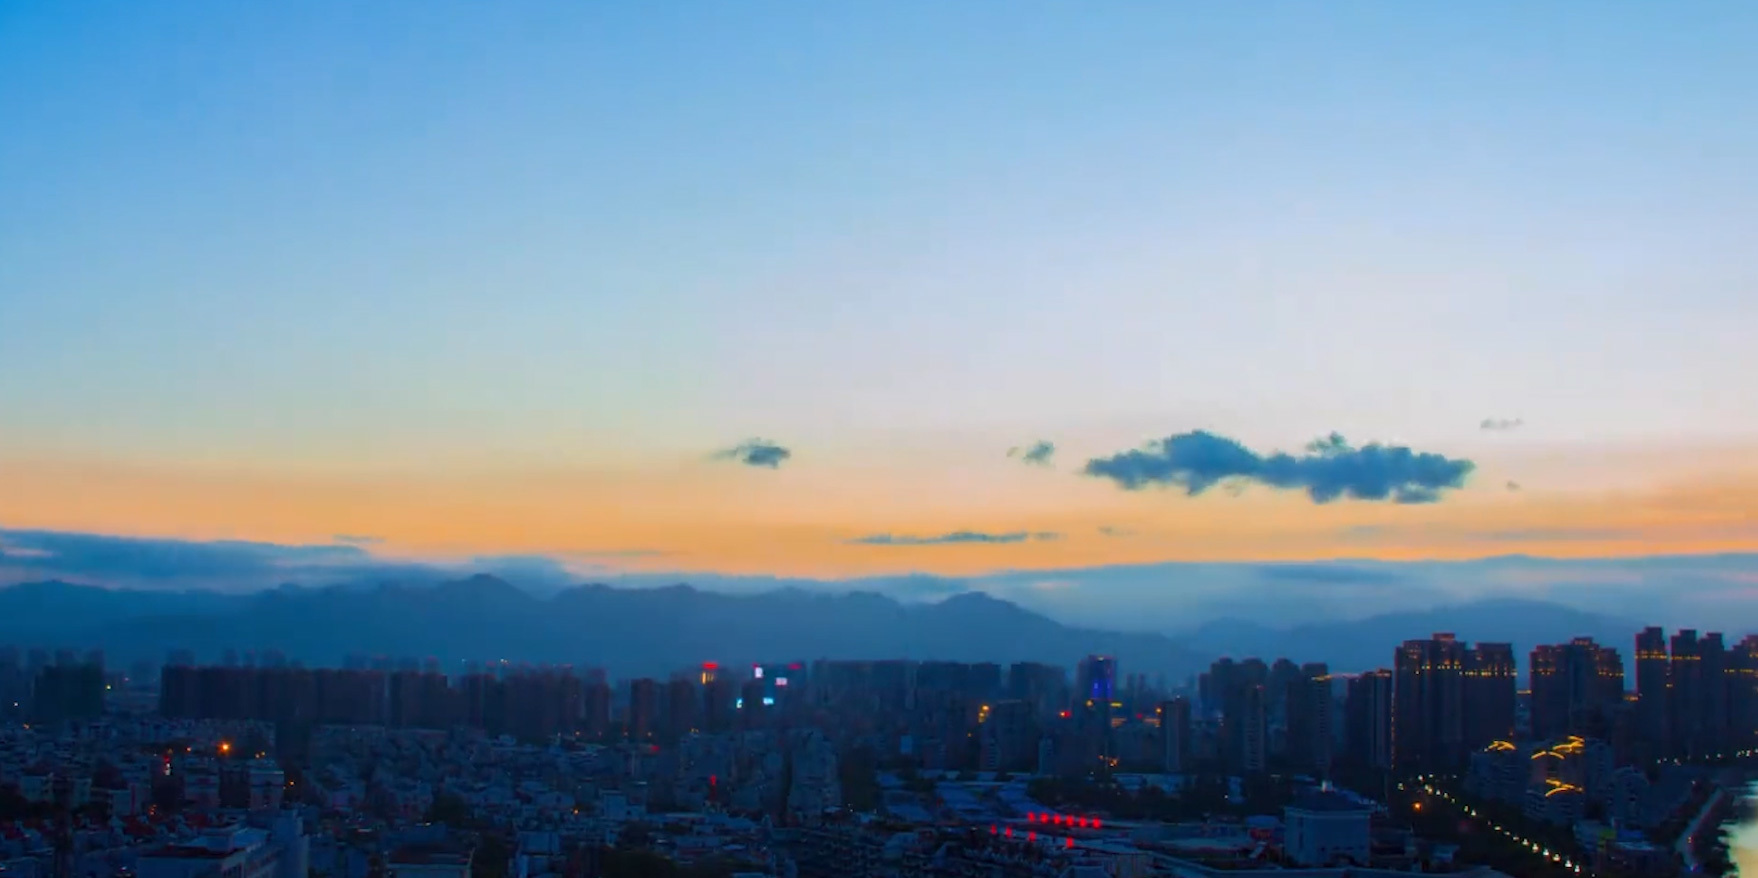 FujianMinmetalsCBMCO.,Ltd.